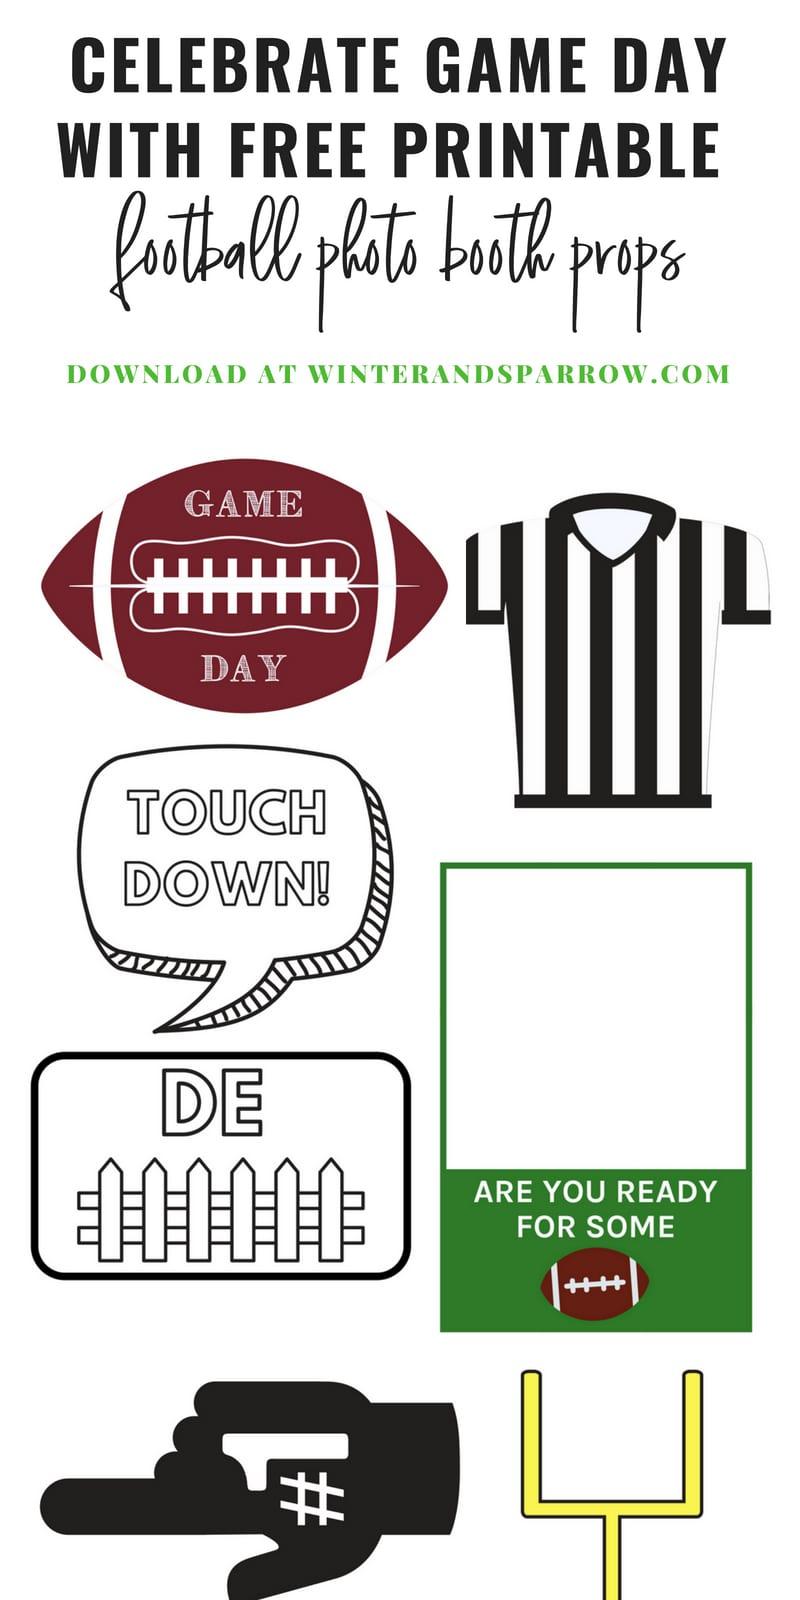 Celebrate Game Day With Free Printable Football Photo Booth Props | winterandsparrow.com #photobooth #footballseason #fridaynightlights